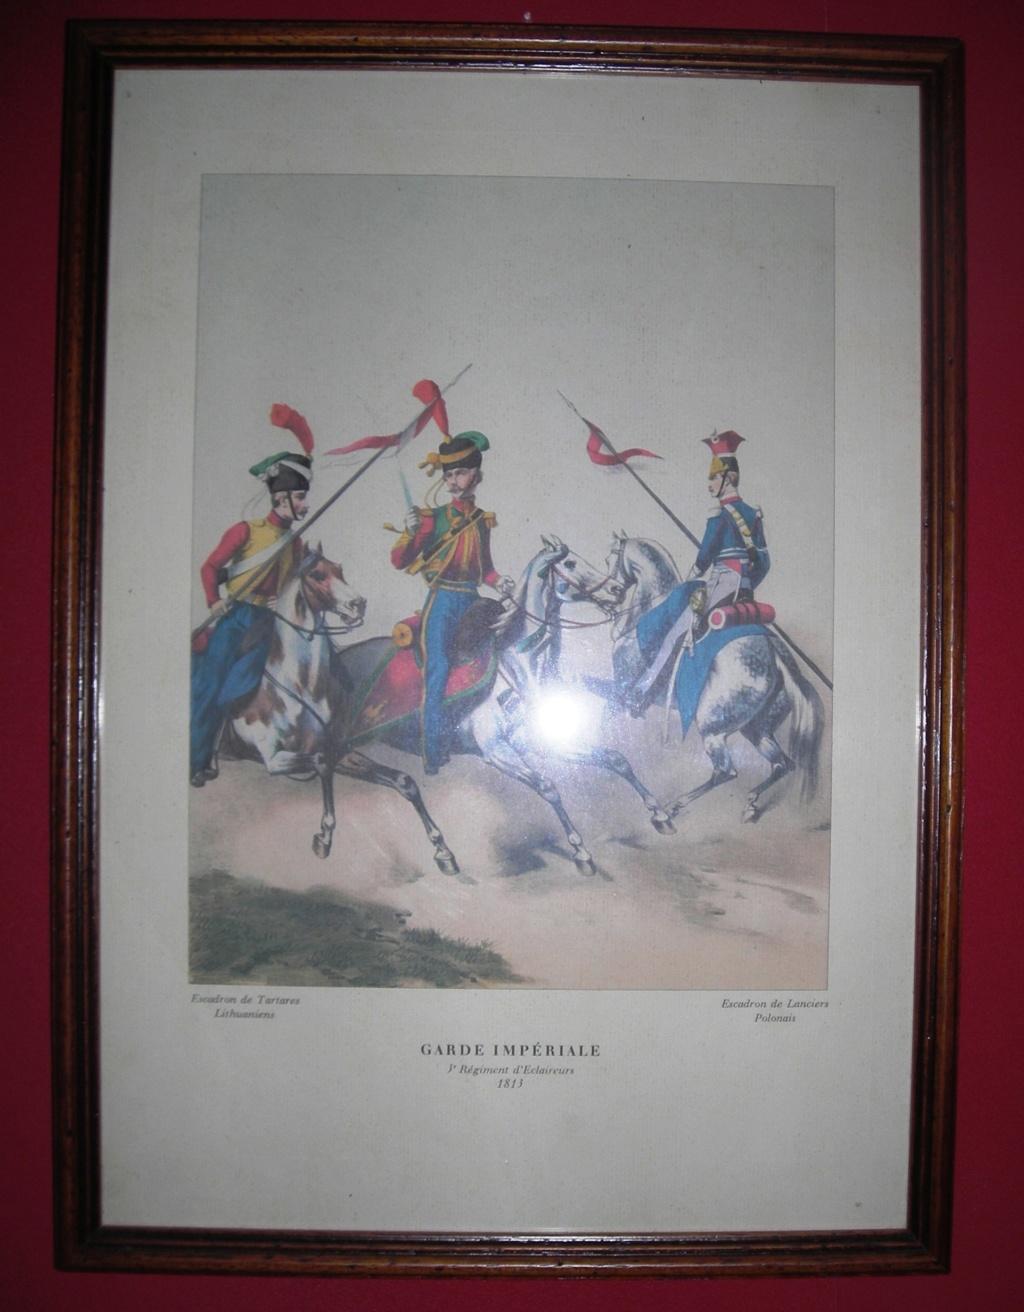 VENTE GRAVURES PREMIER EMPIRE, GARDE IMPERIALE. 181310